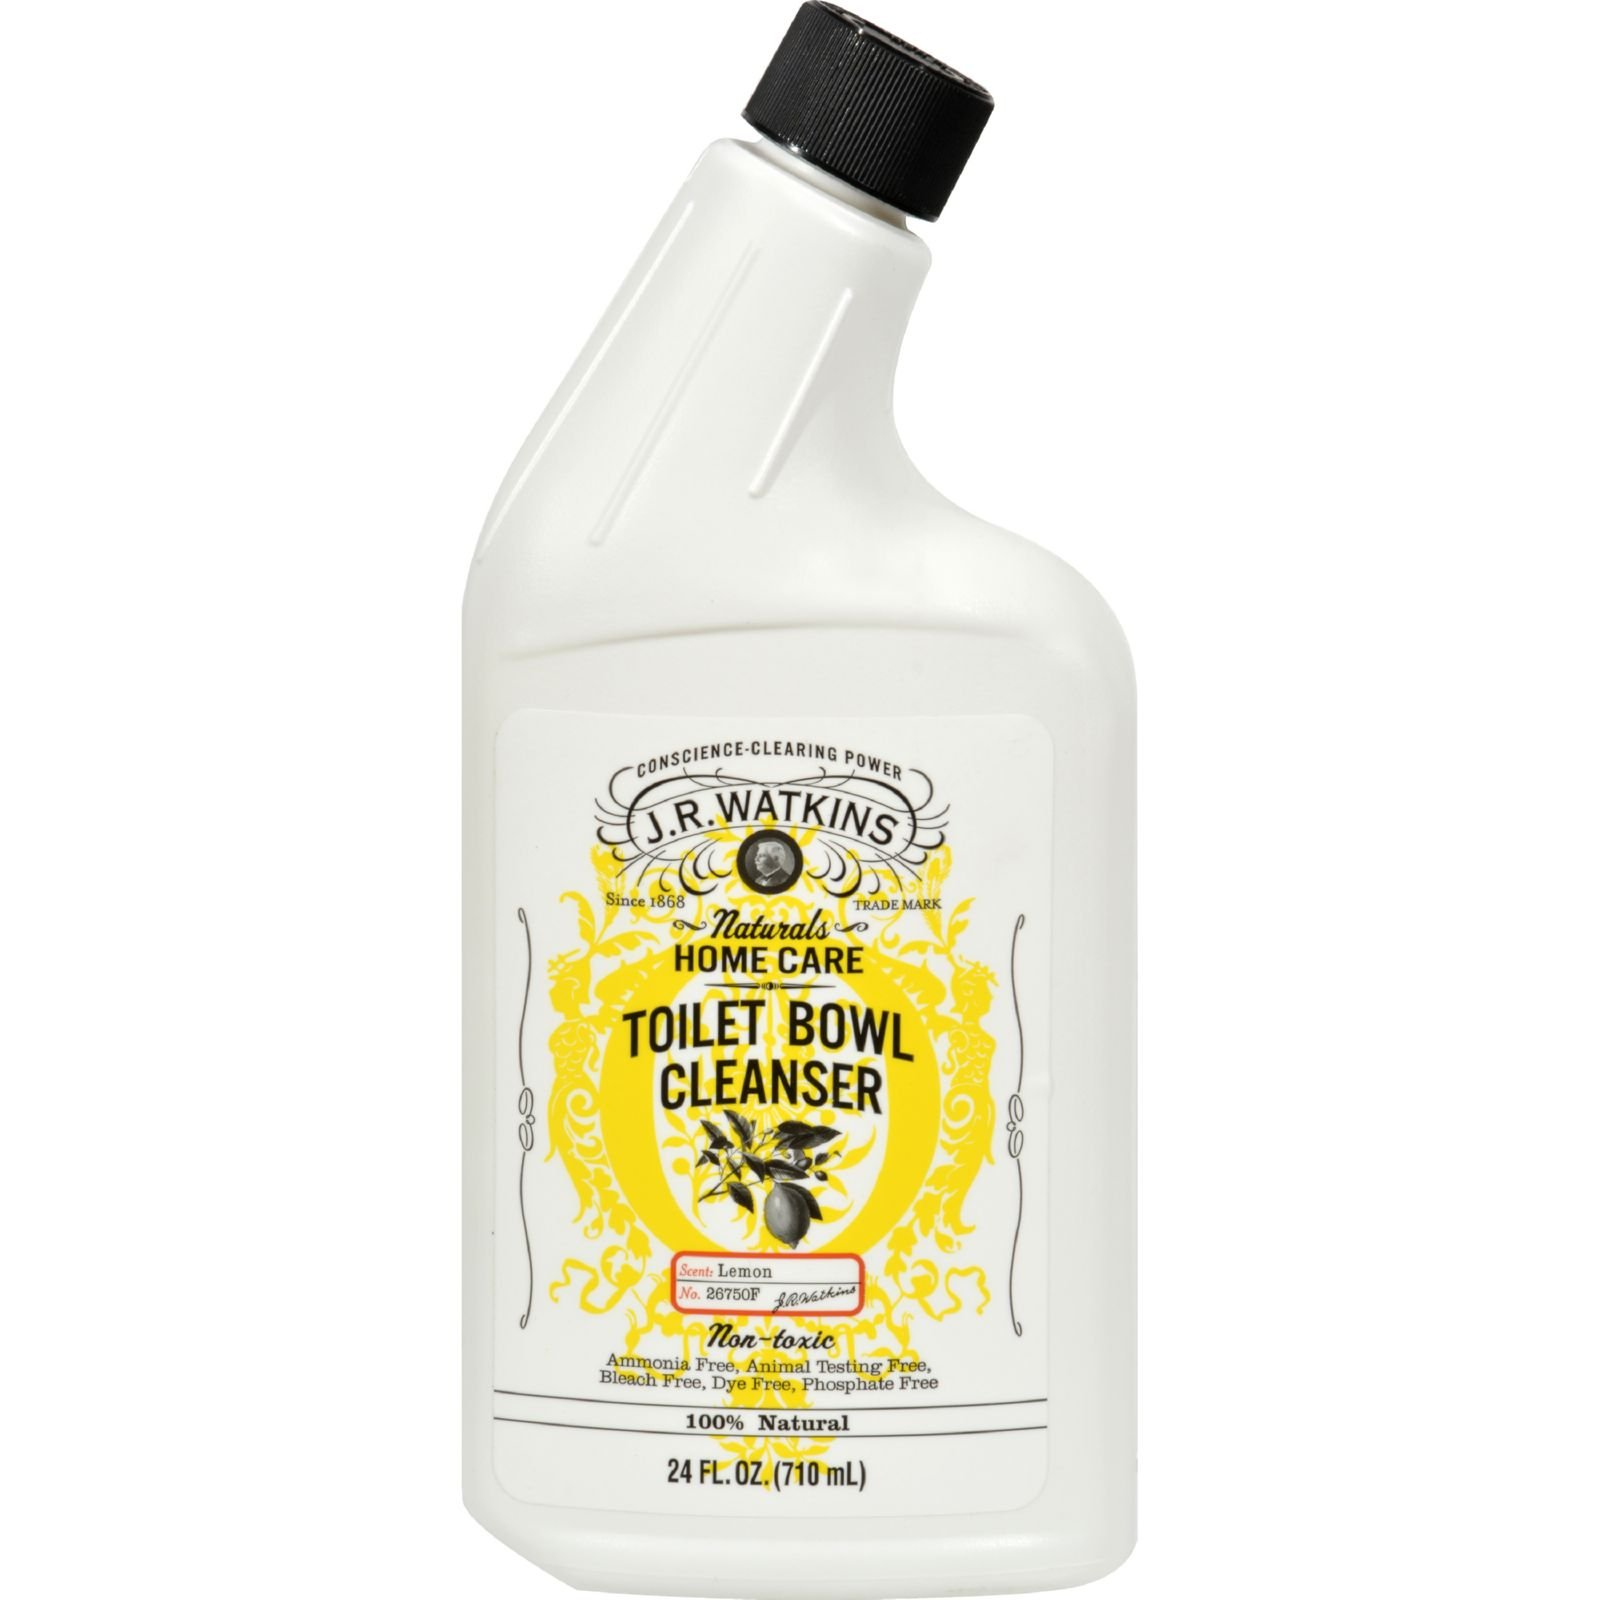 J.R. Watkins Toilet Bowl Cleanser Lemon - Natural - 24 fl oz (Pack of 4)